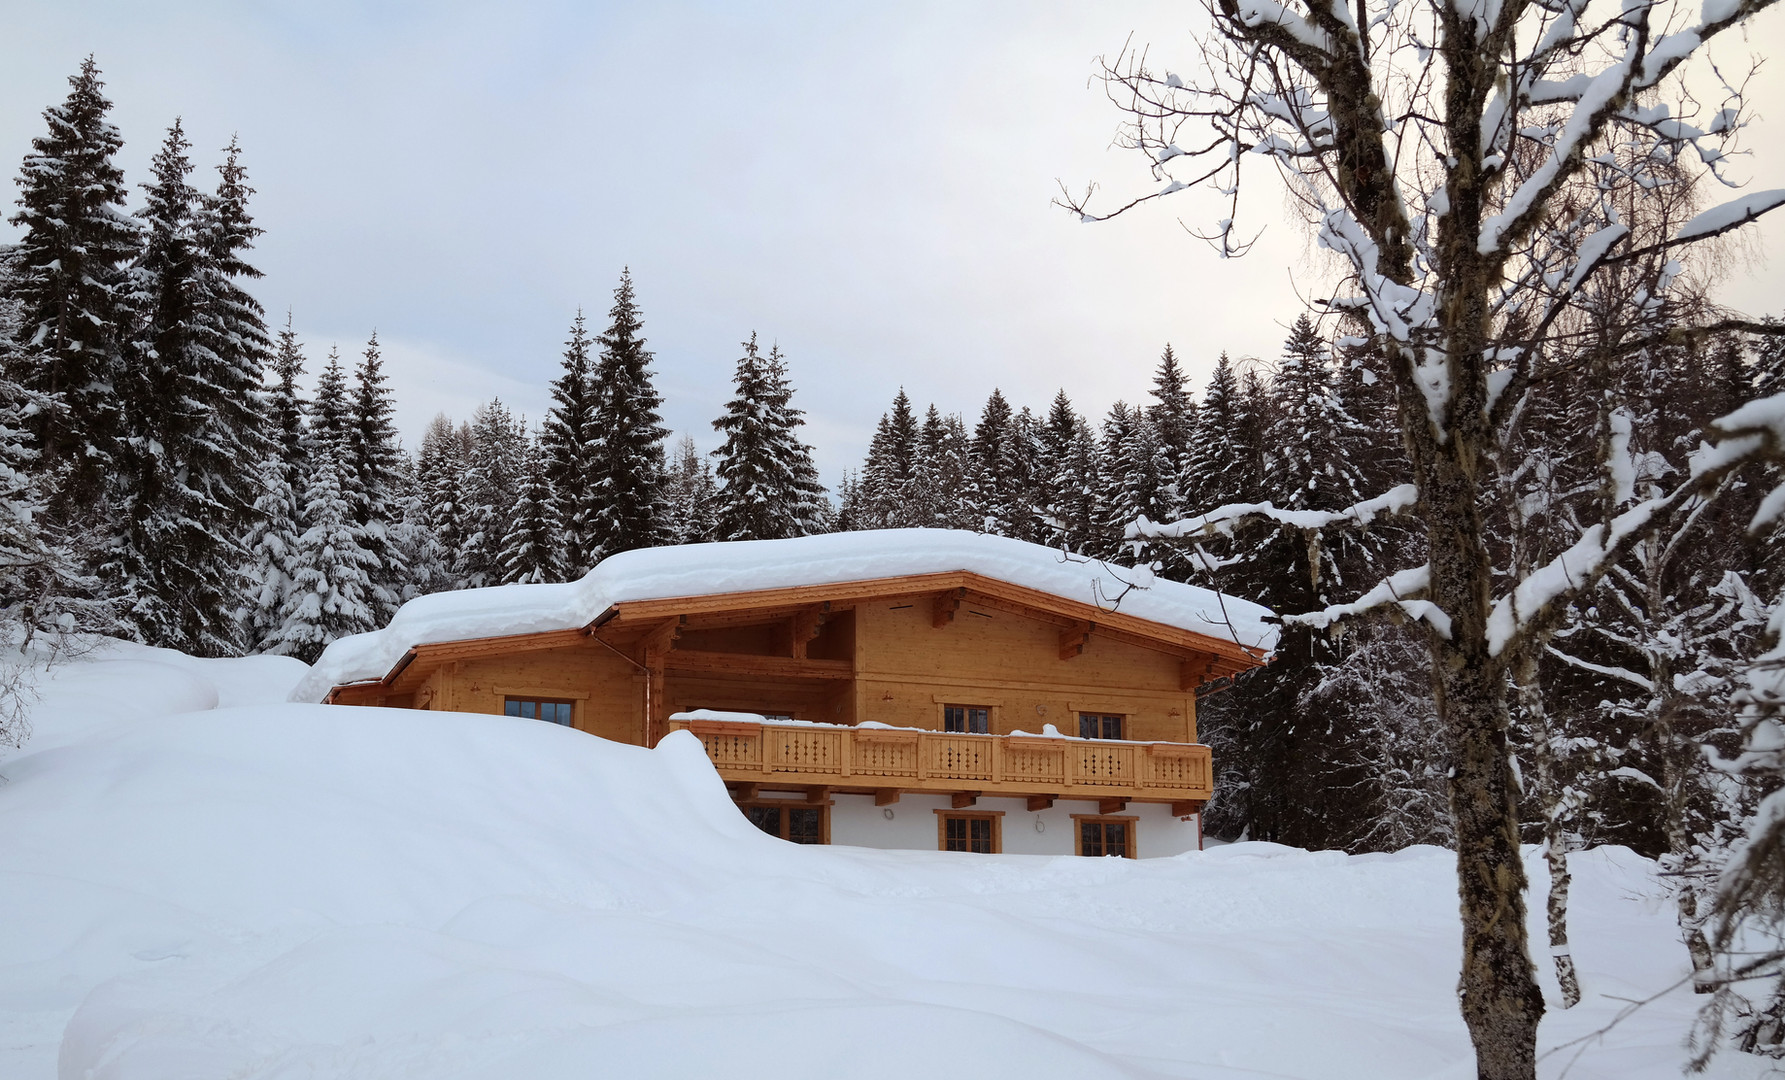 huckfeld im schnee.jpg